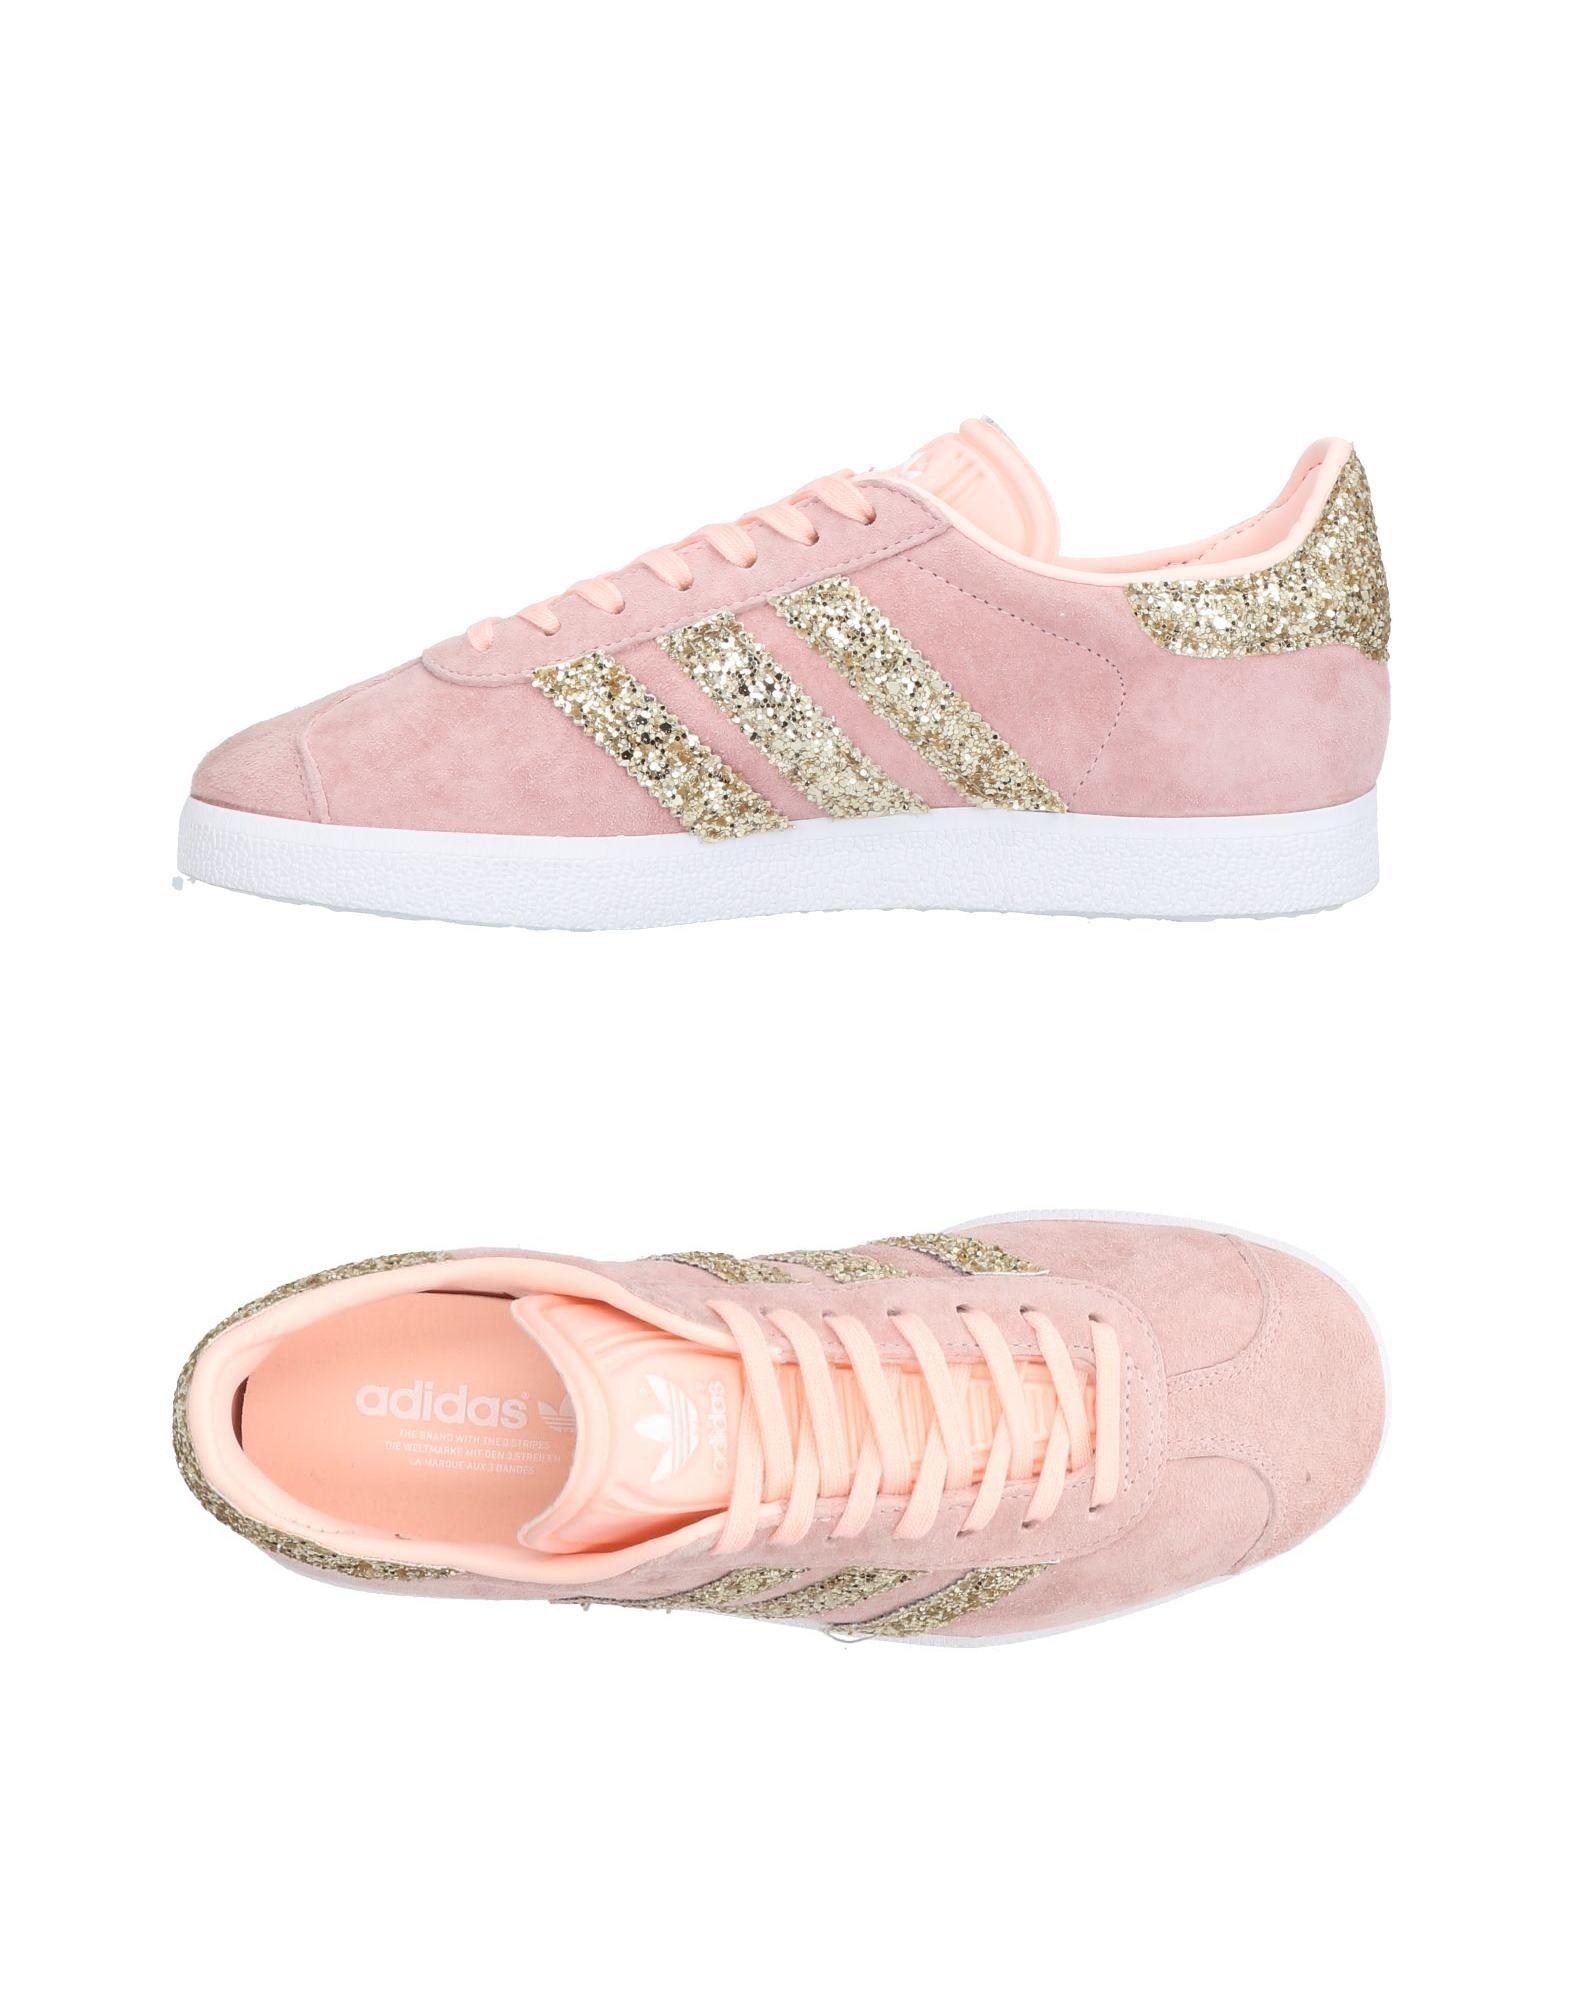 Adidas Adidas Originals Sneakers - Women Adidas Adidas Originals Sneakers online on  United Kingdom - 11489086TQ 07856a